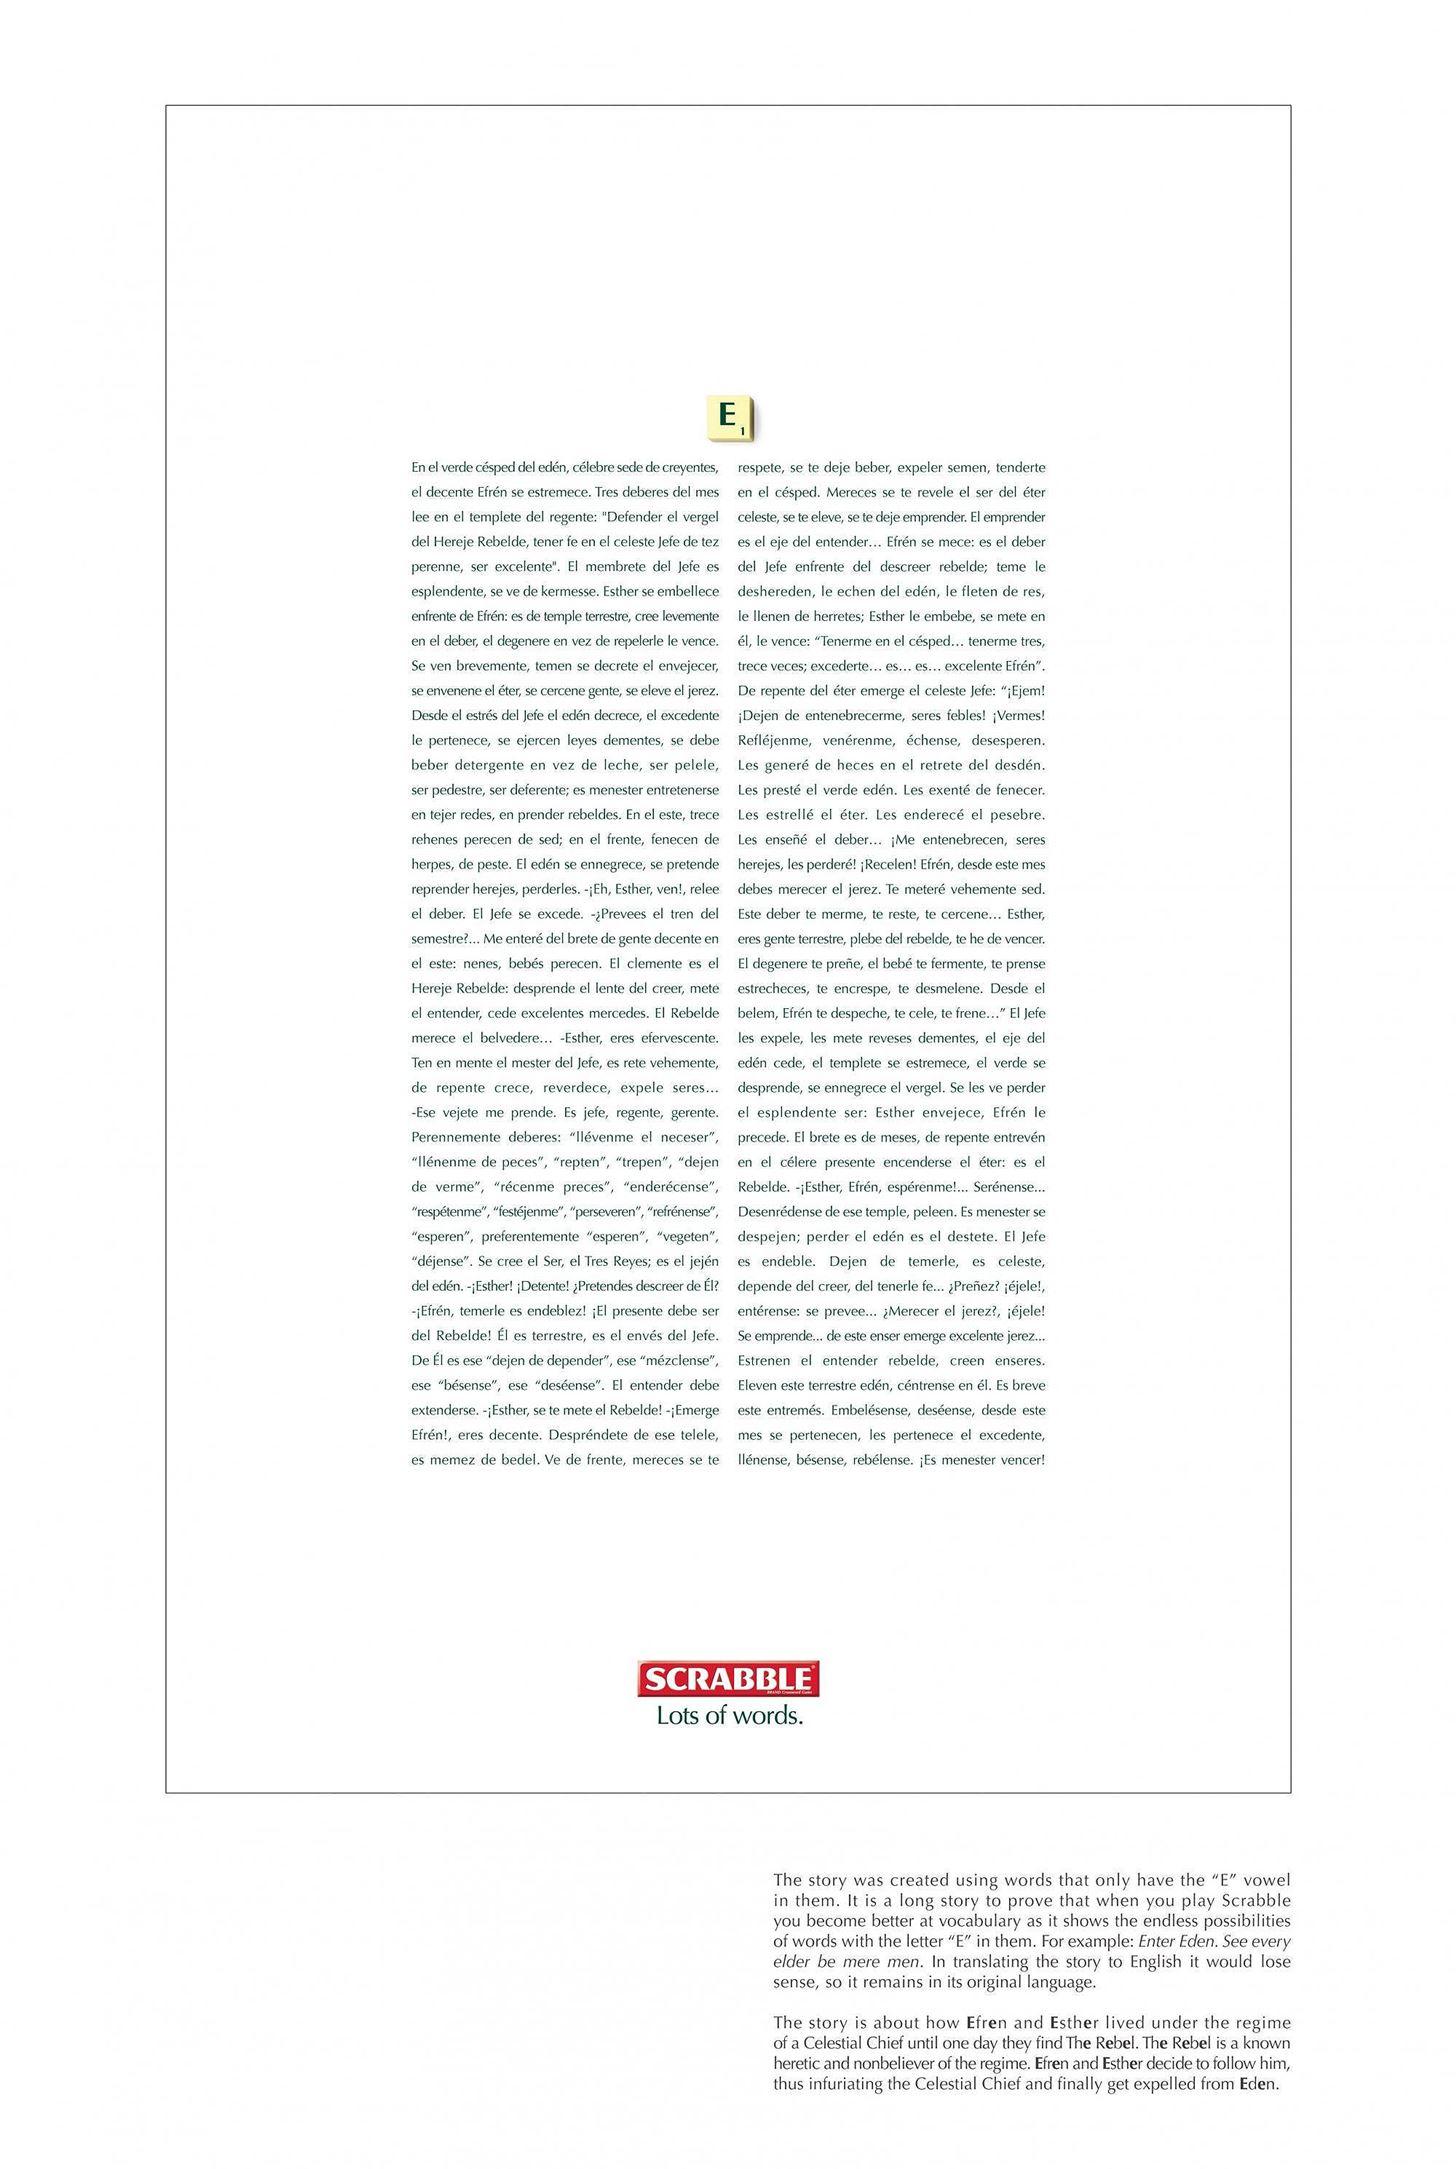 Ogilvy & Mather's Mattel SCRABBLE Prints